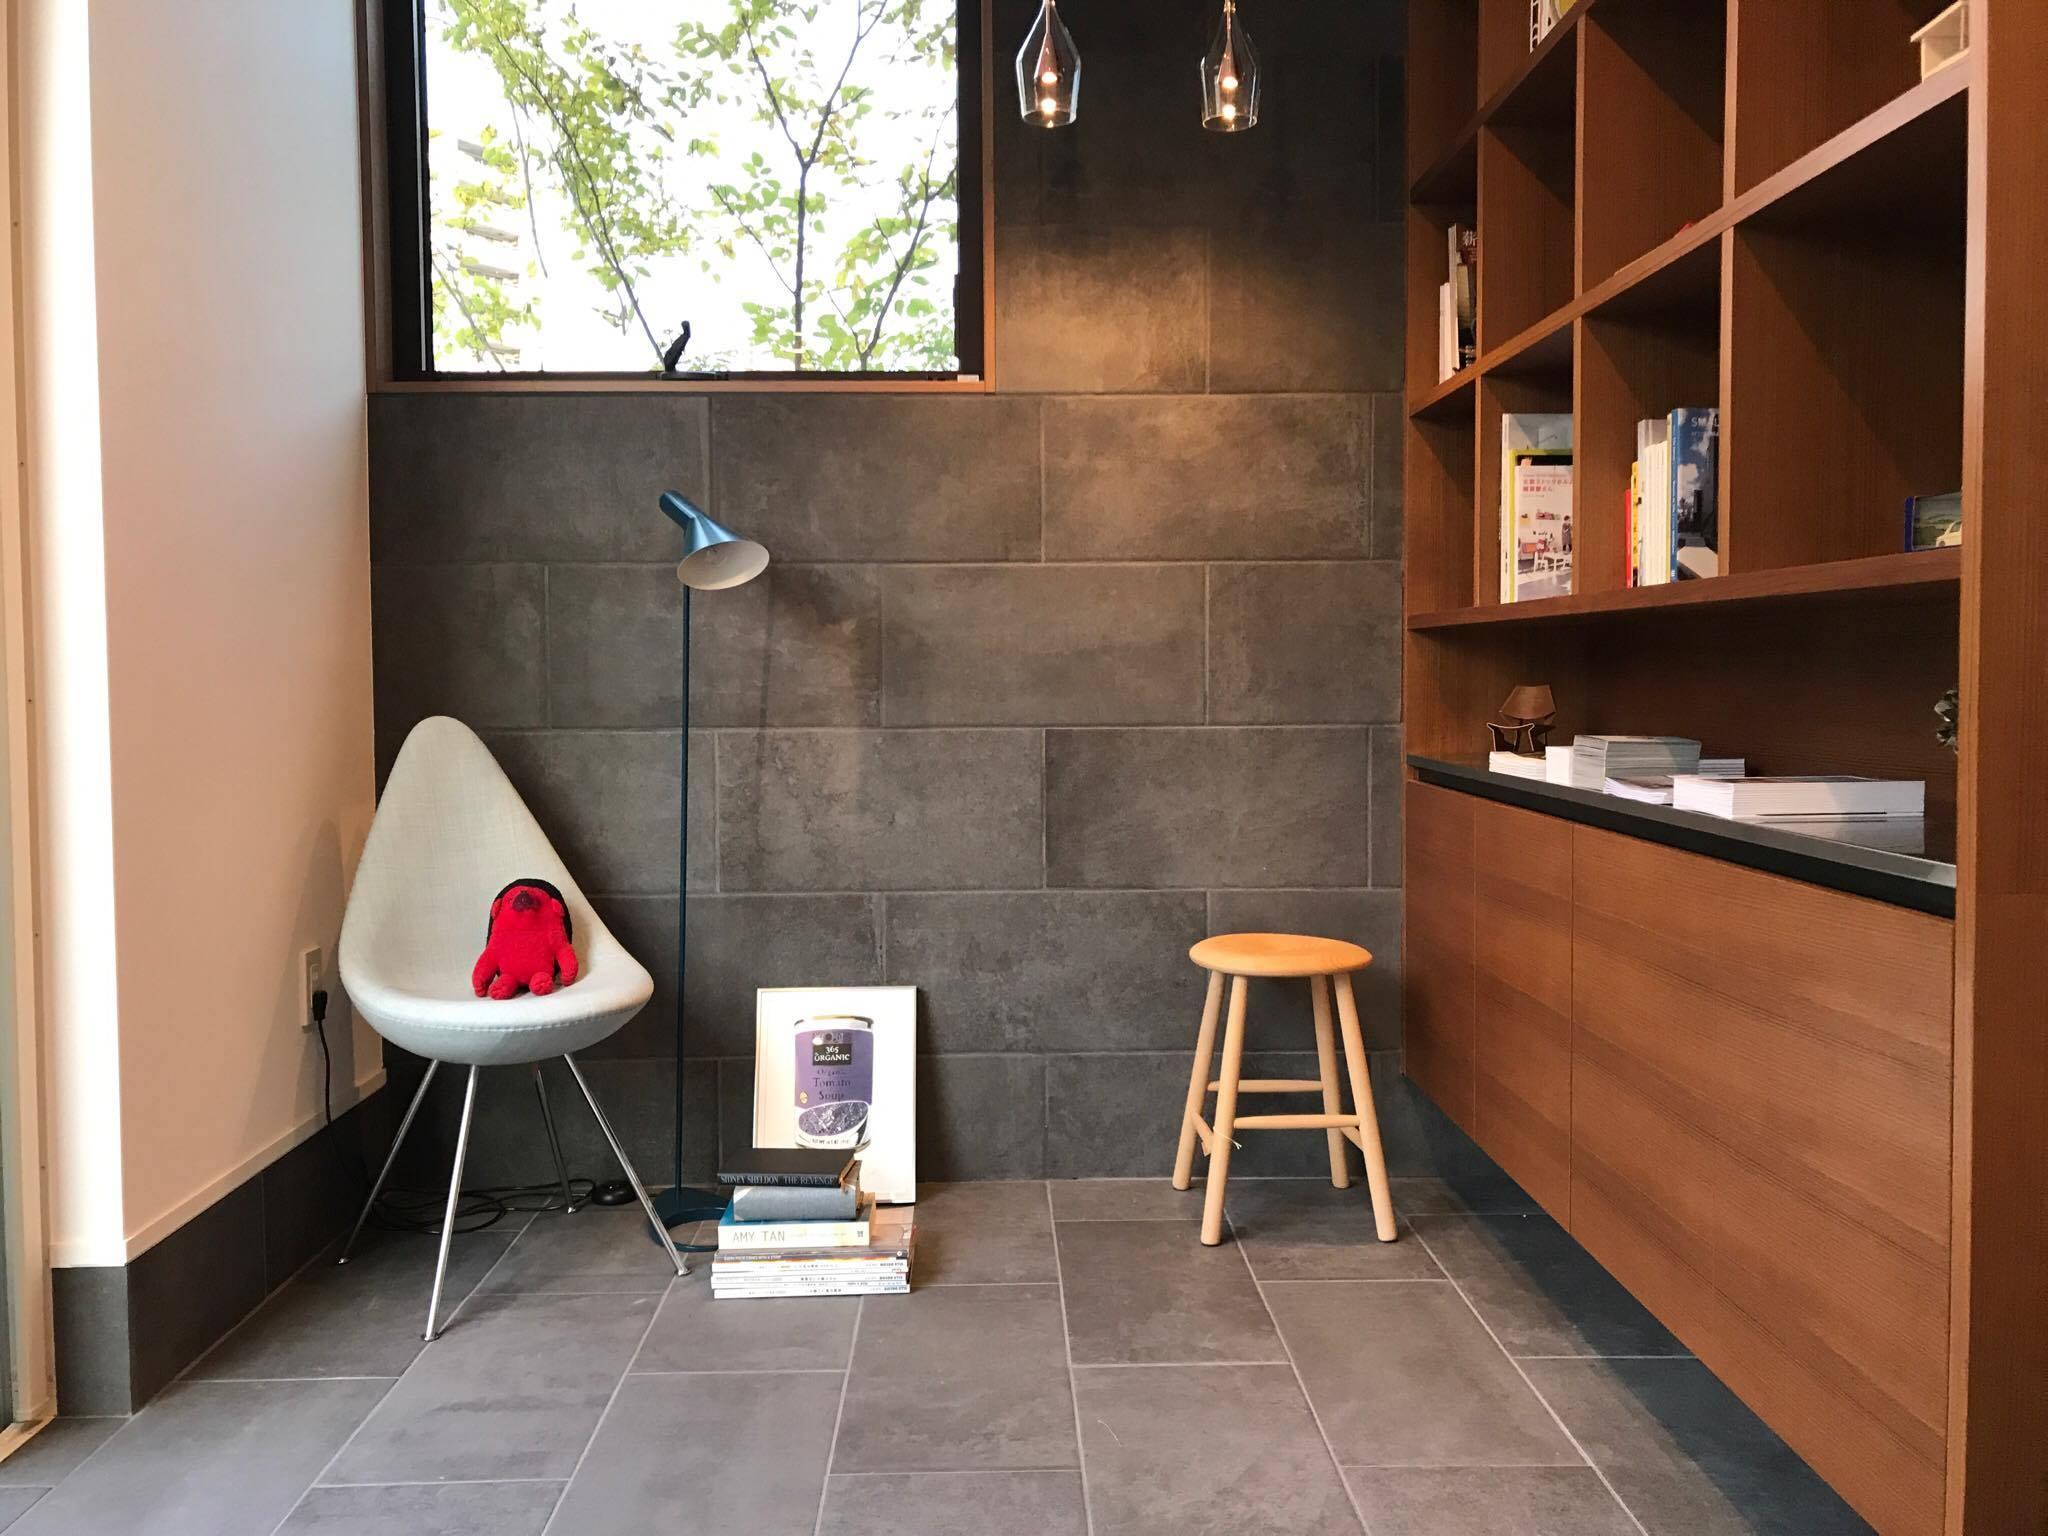 http://www.sora-design.com/images/bl-3974.jpg